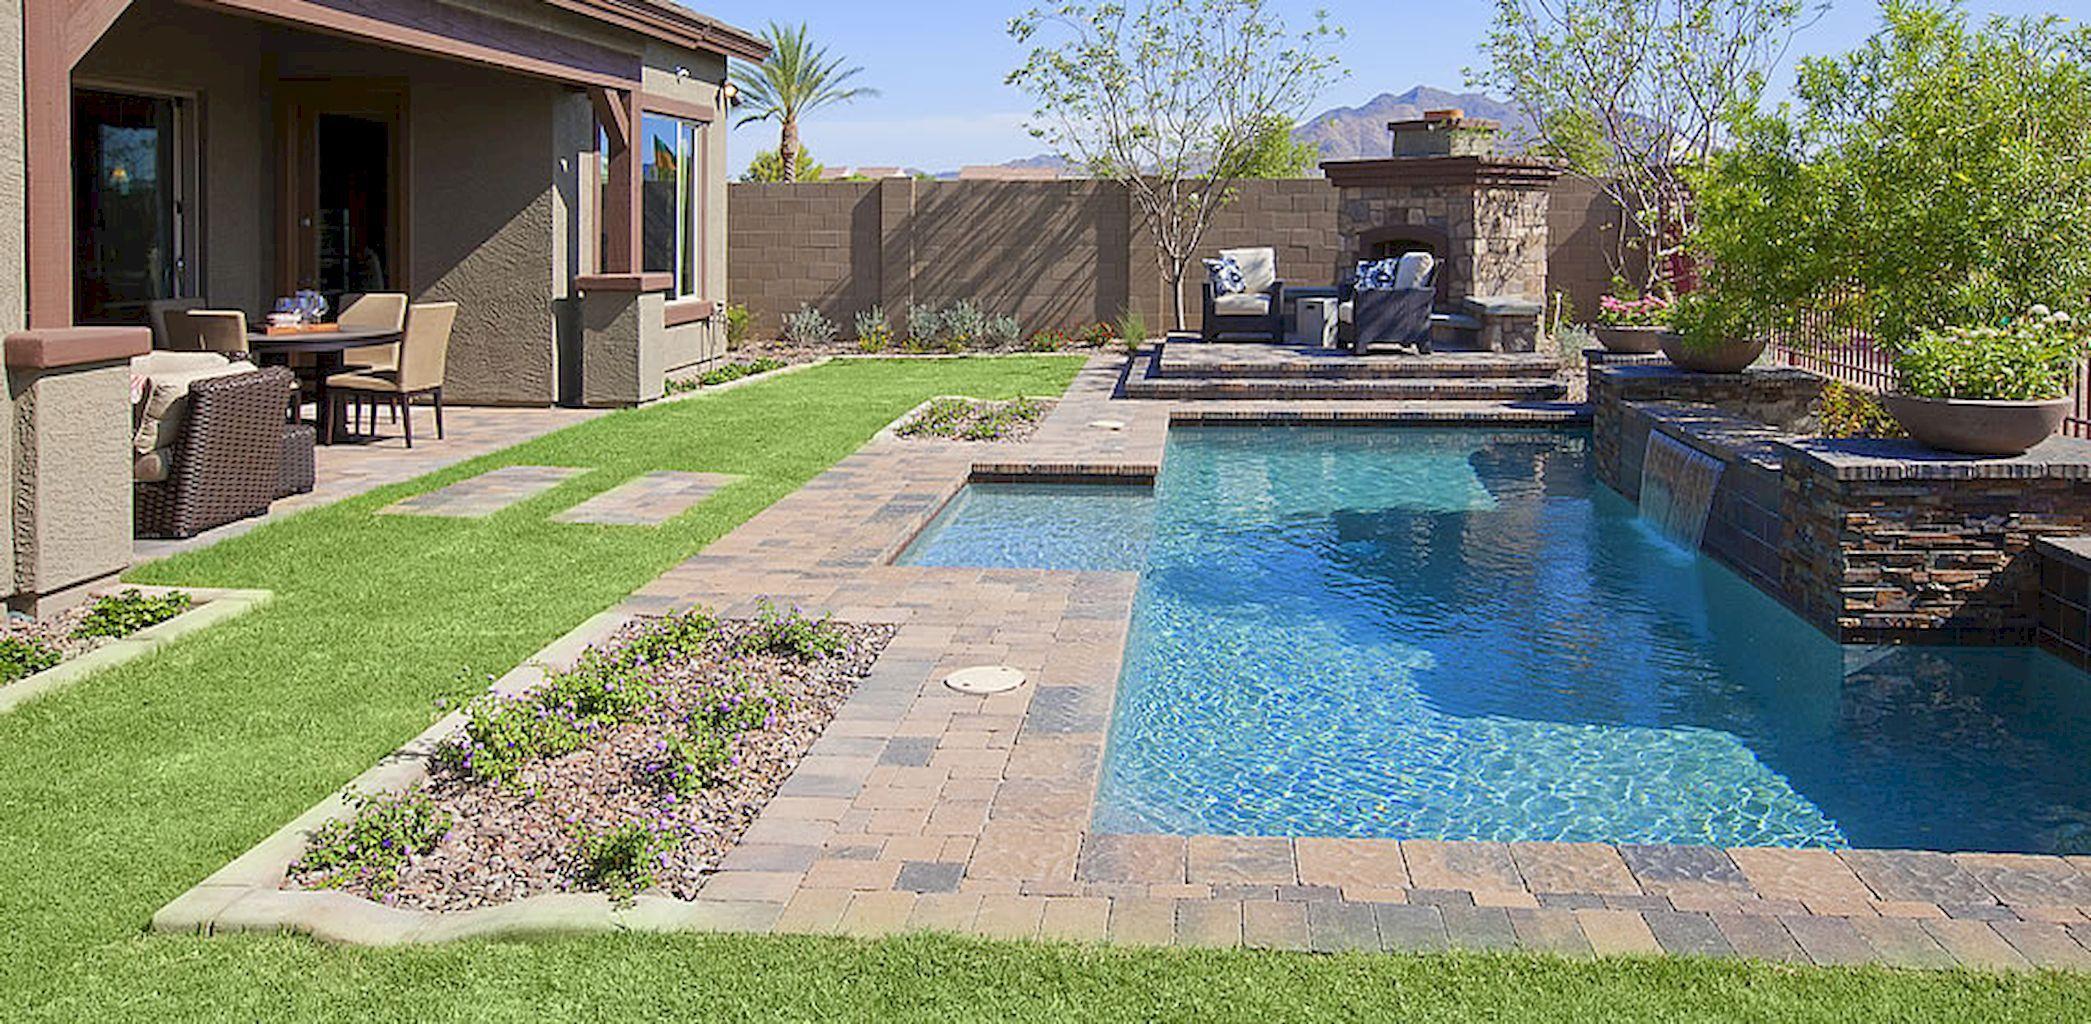 40 arizona backyard ideas on a budget 33 phoenix for Pool design phoenix